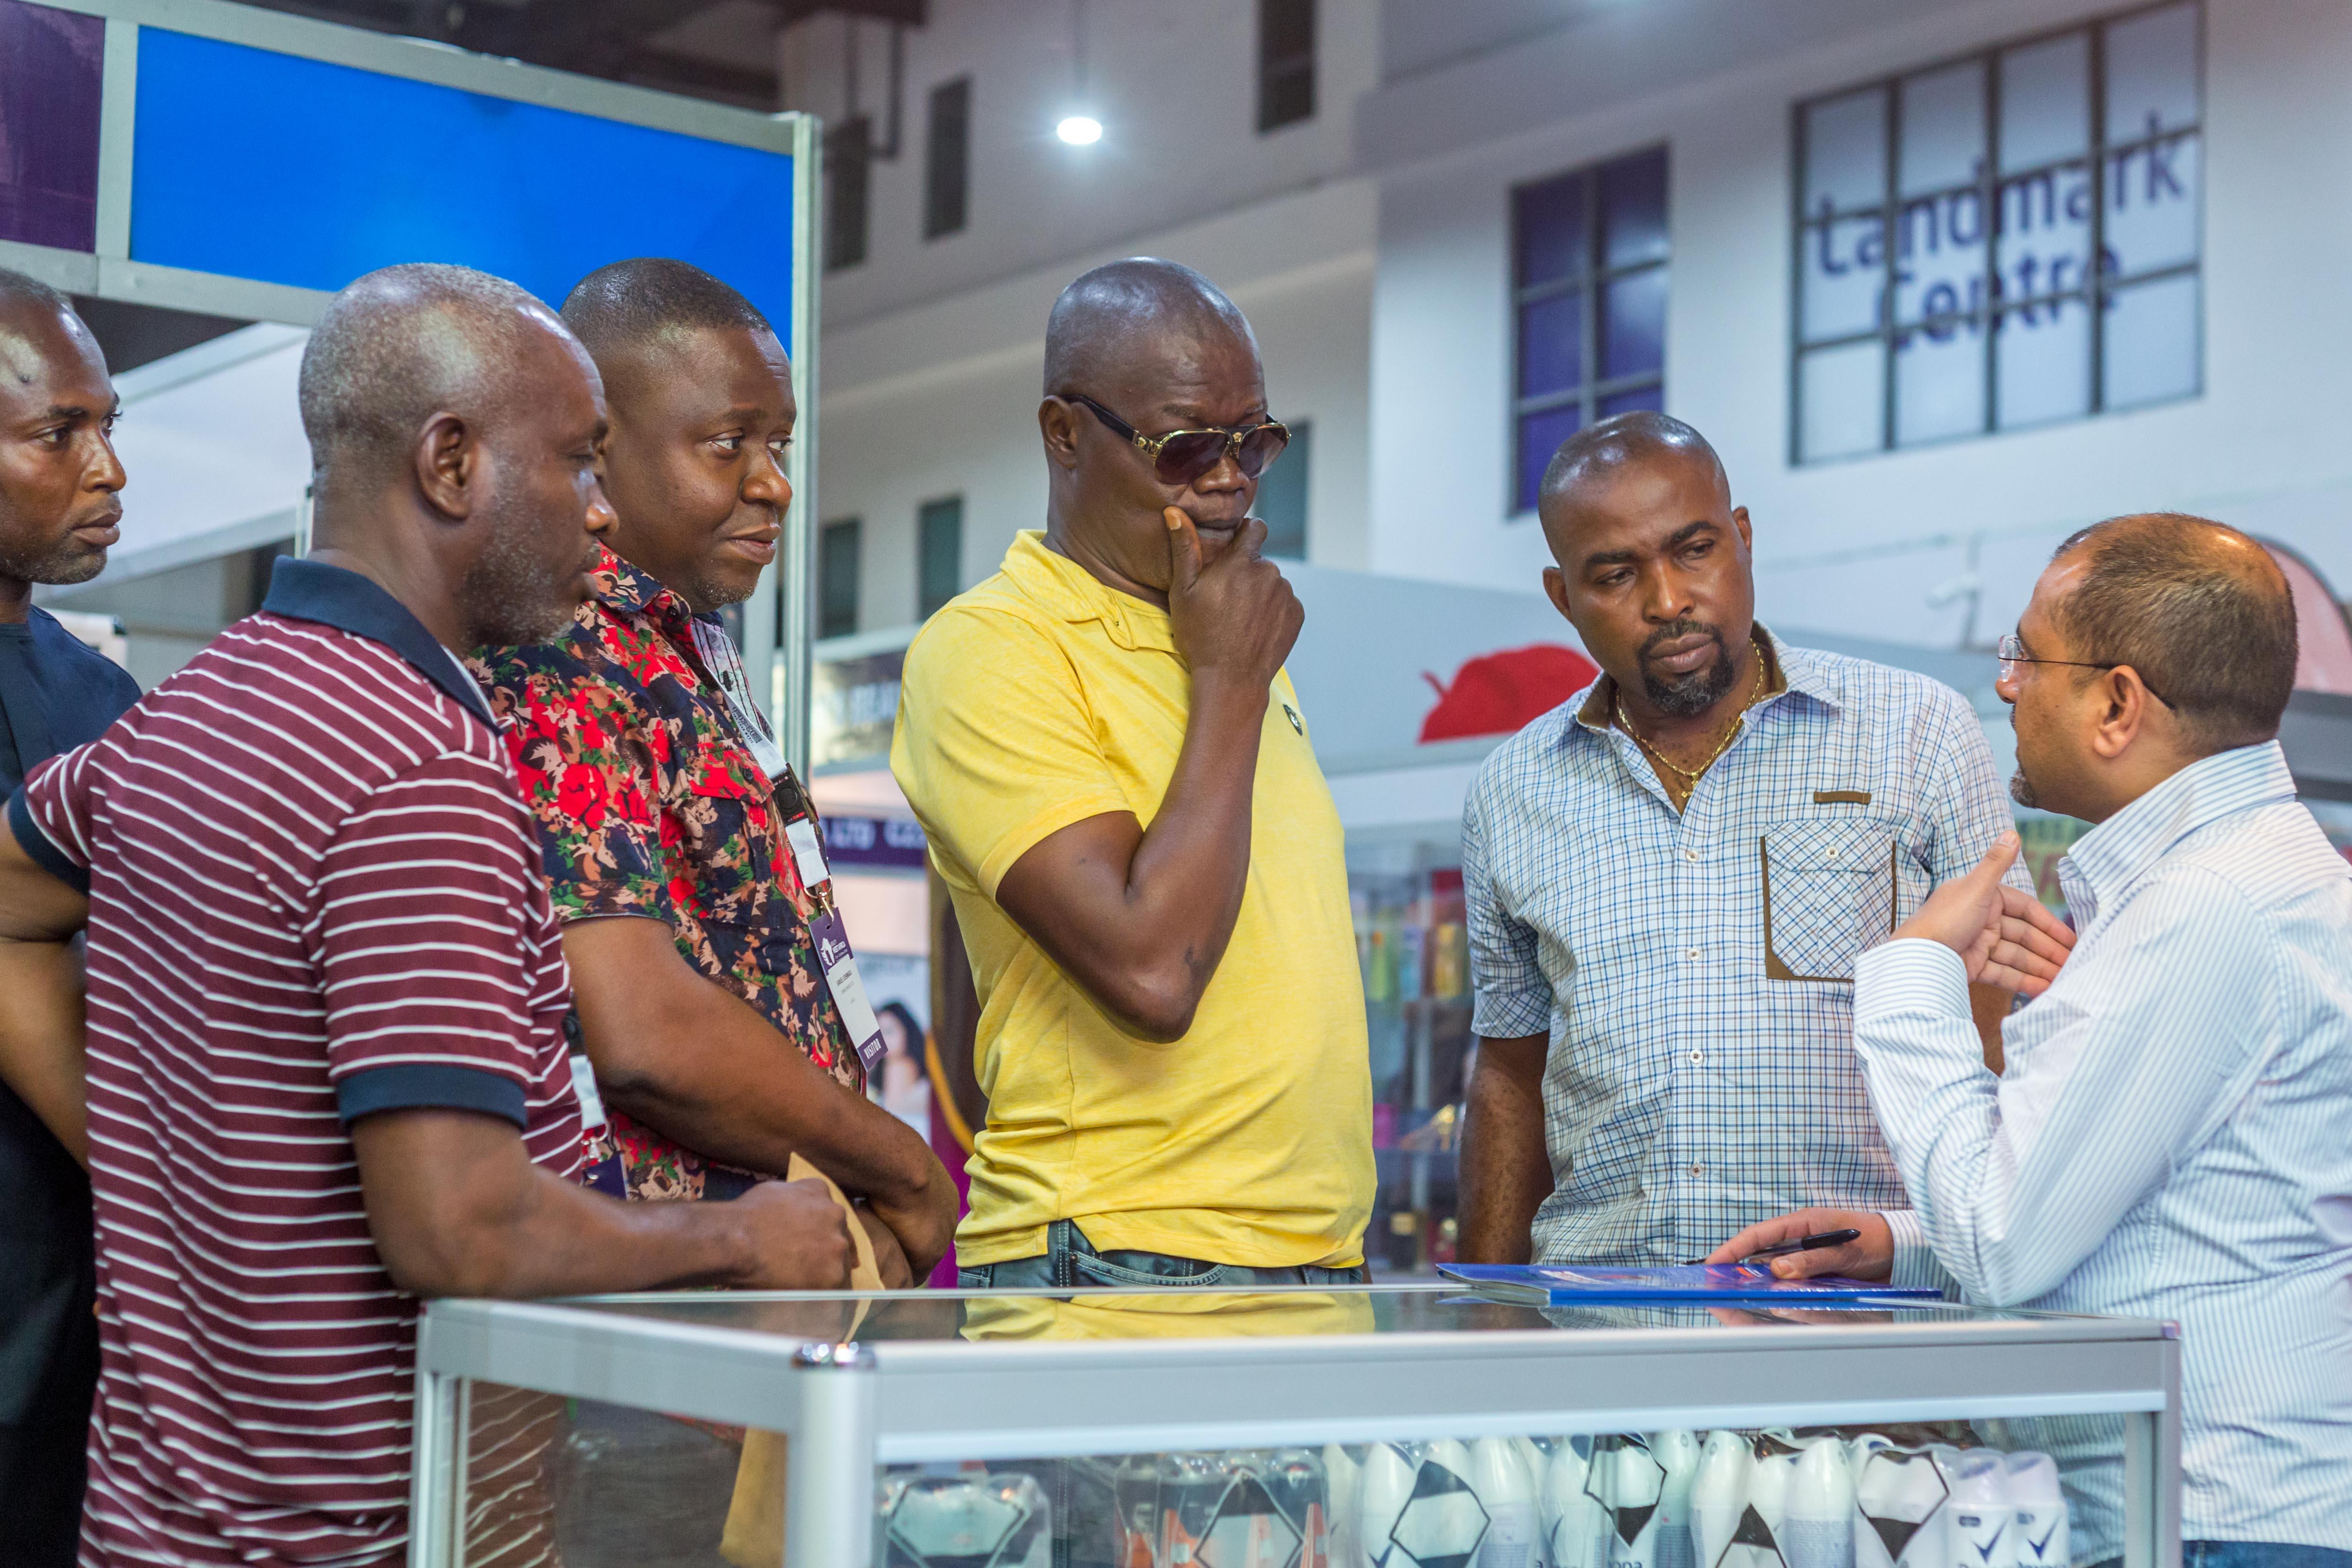 West Africa Automotive Show, Nigeria, Africa | WAAS